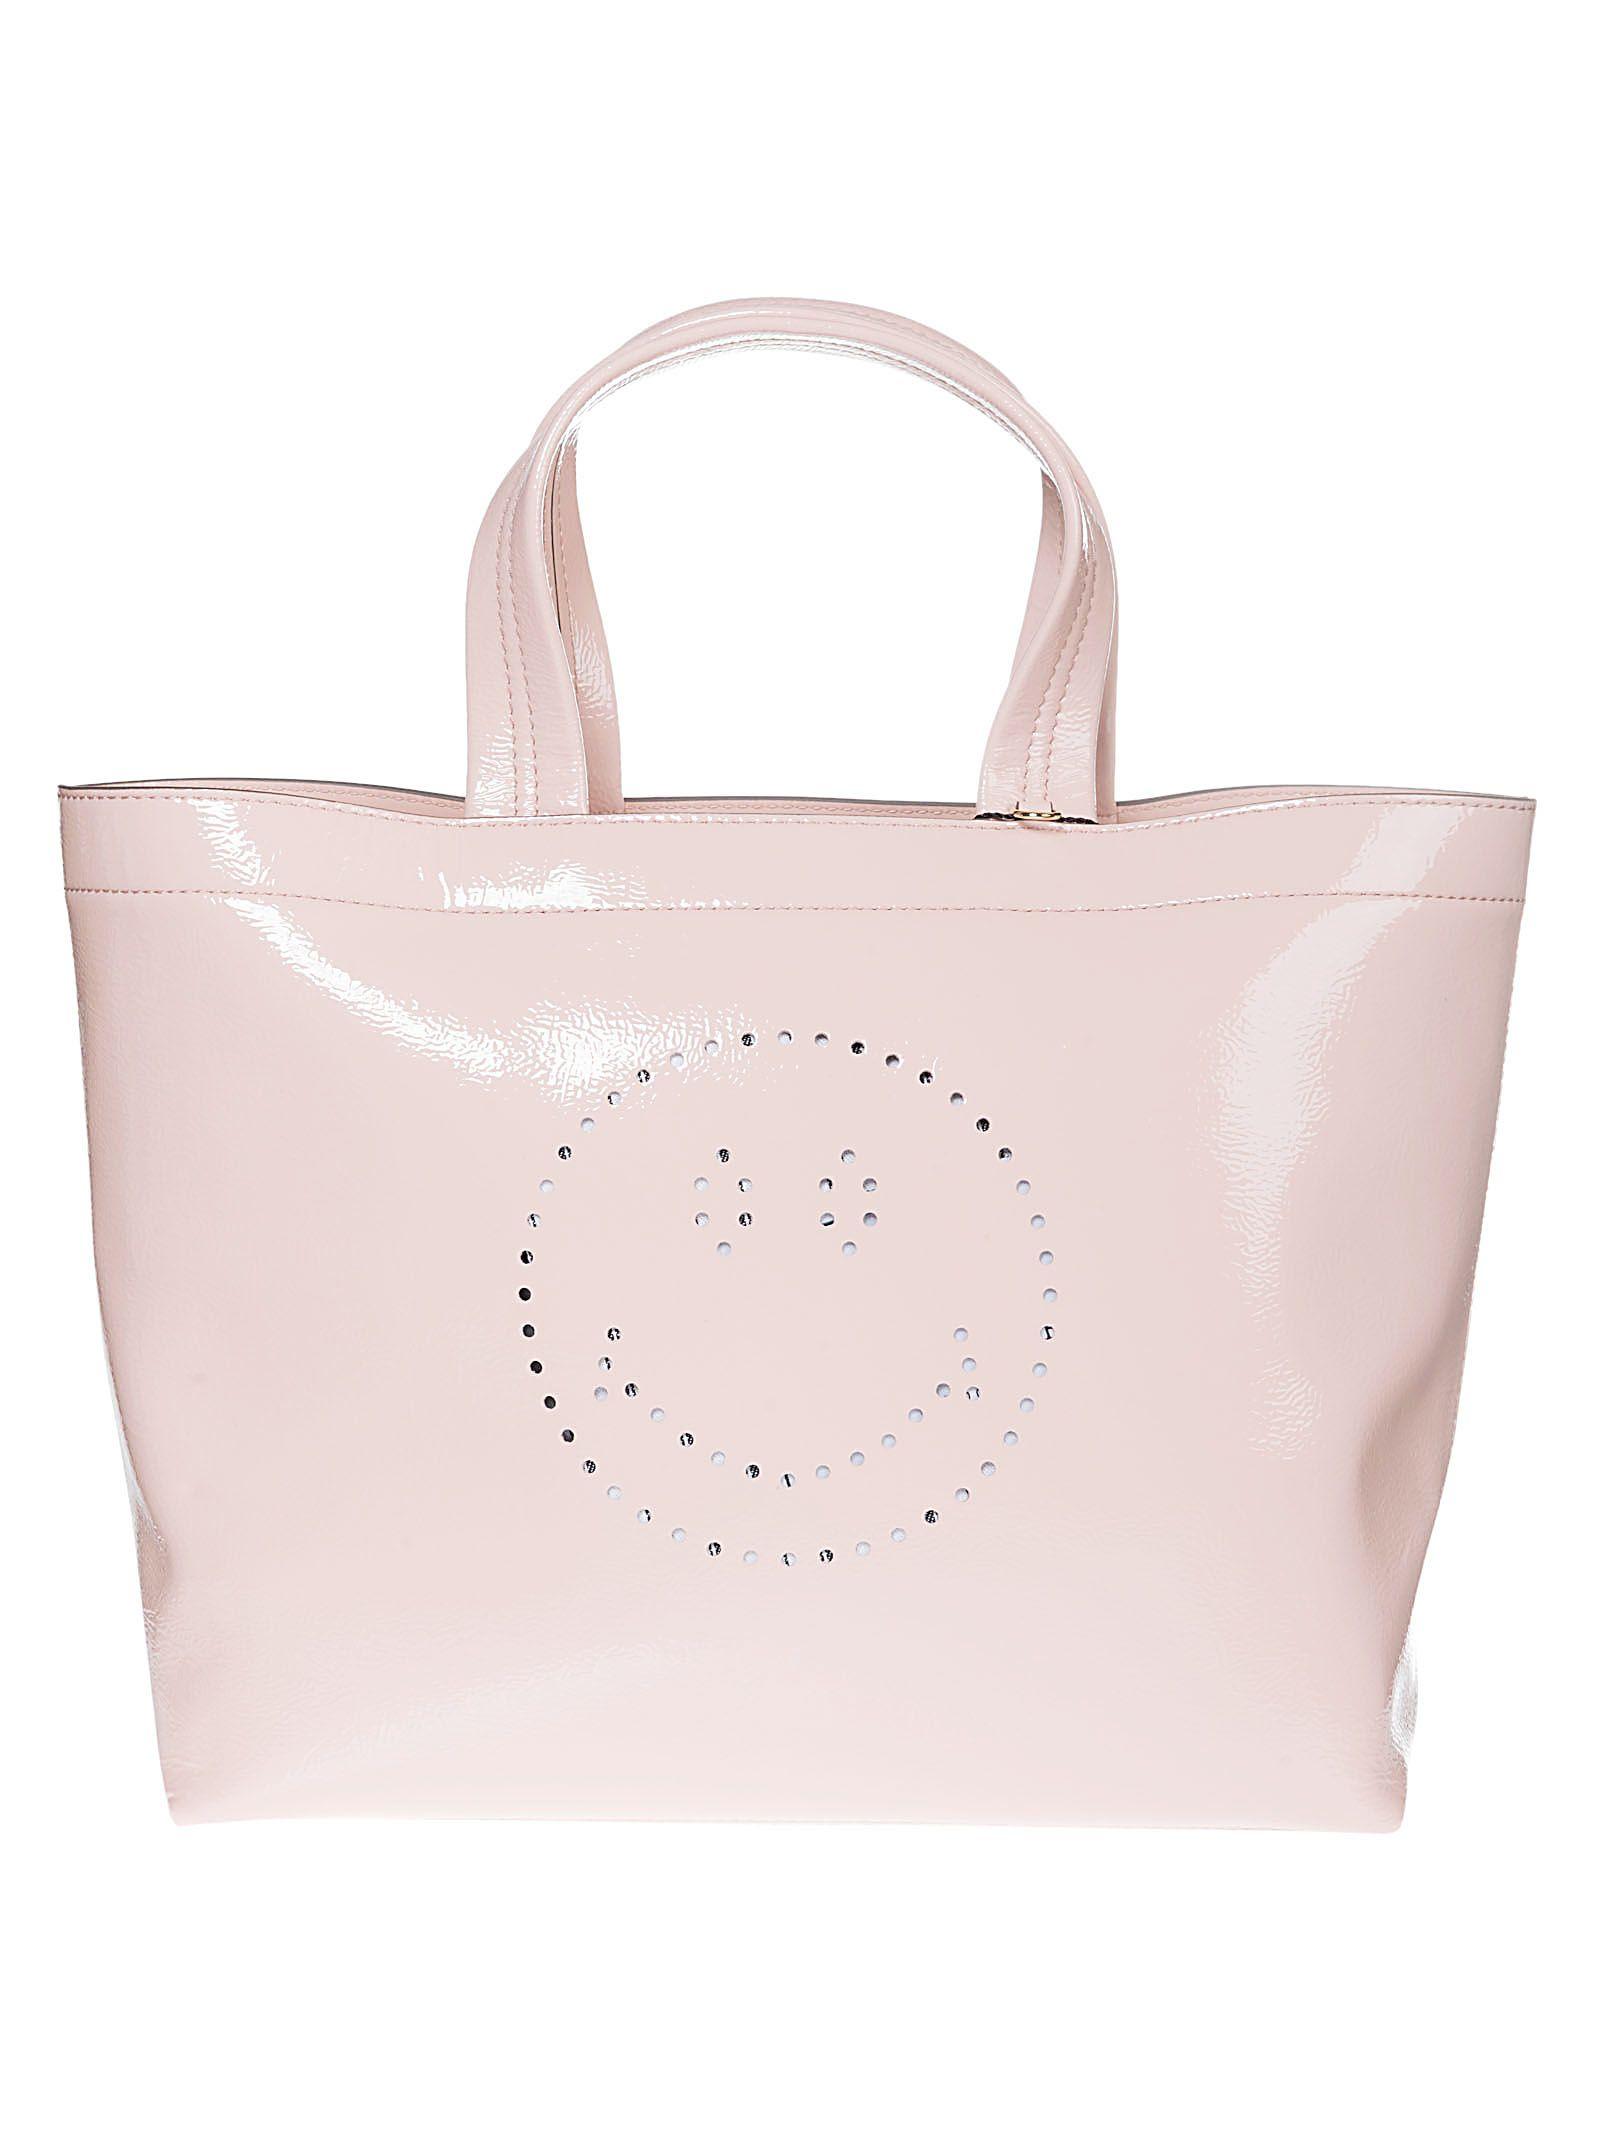 Anya Hindmarch Smiley Shopper Bag